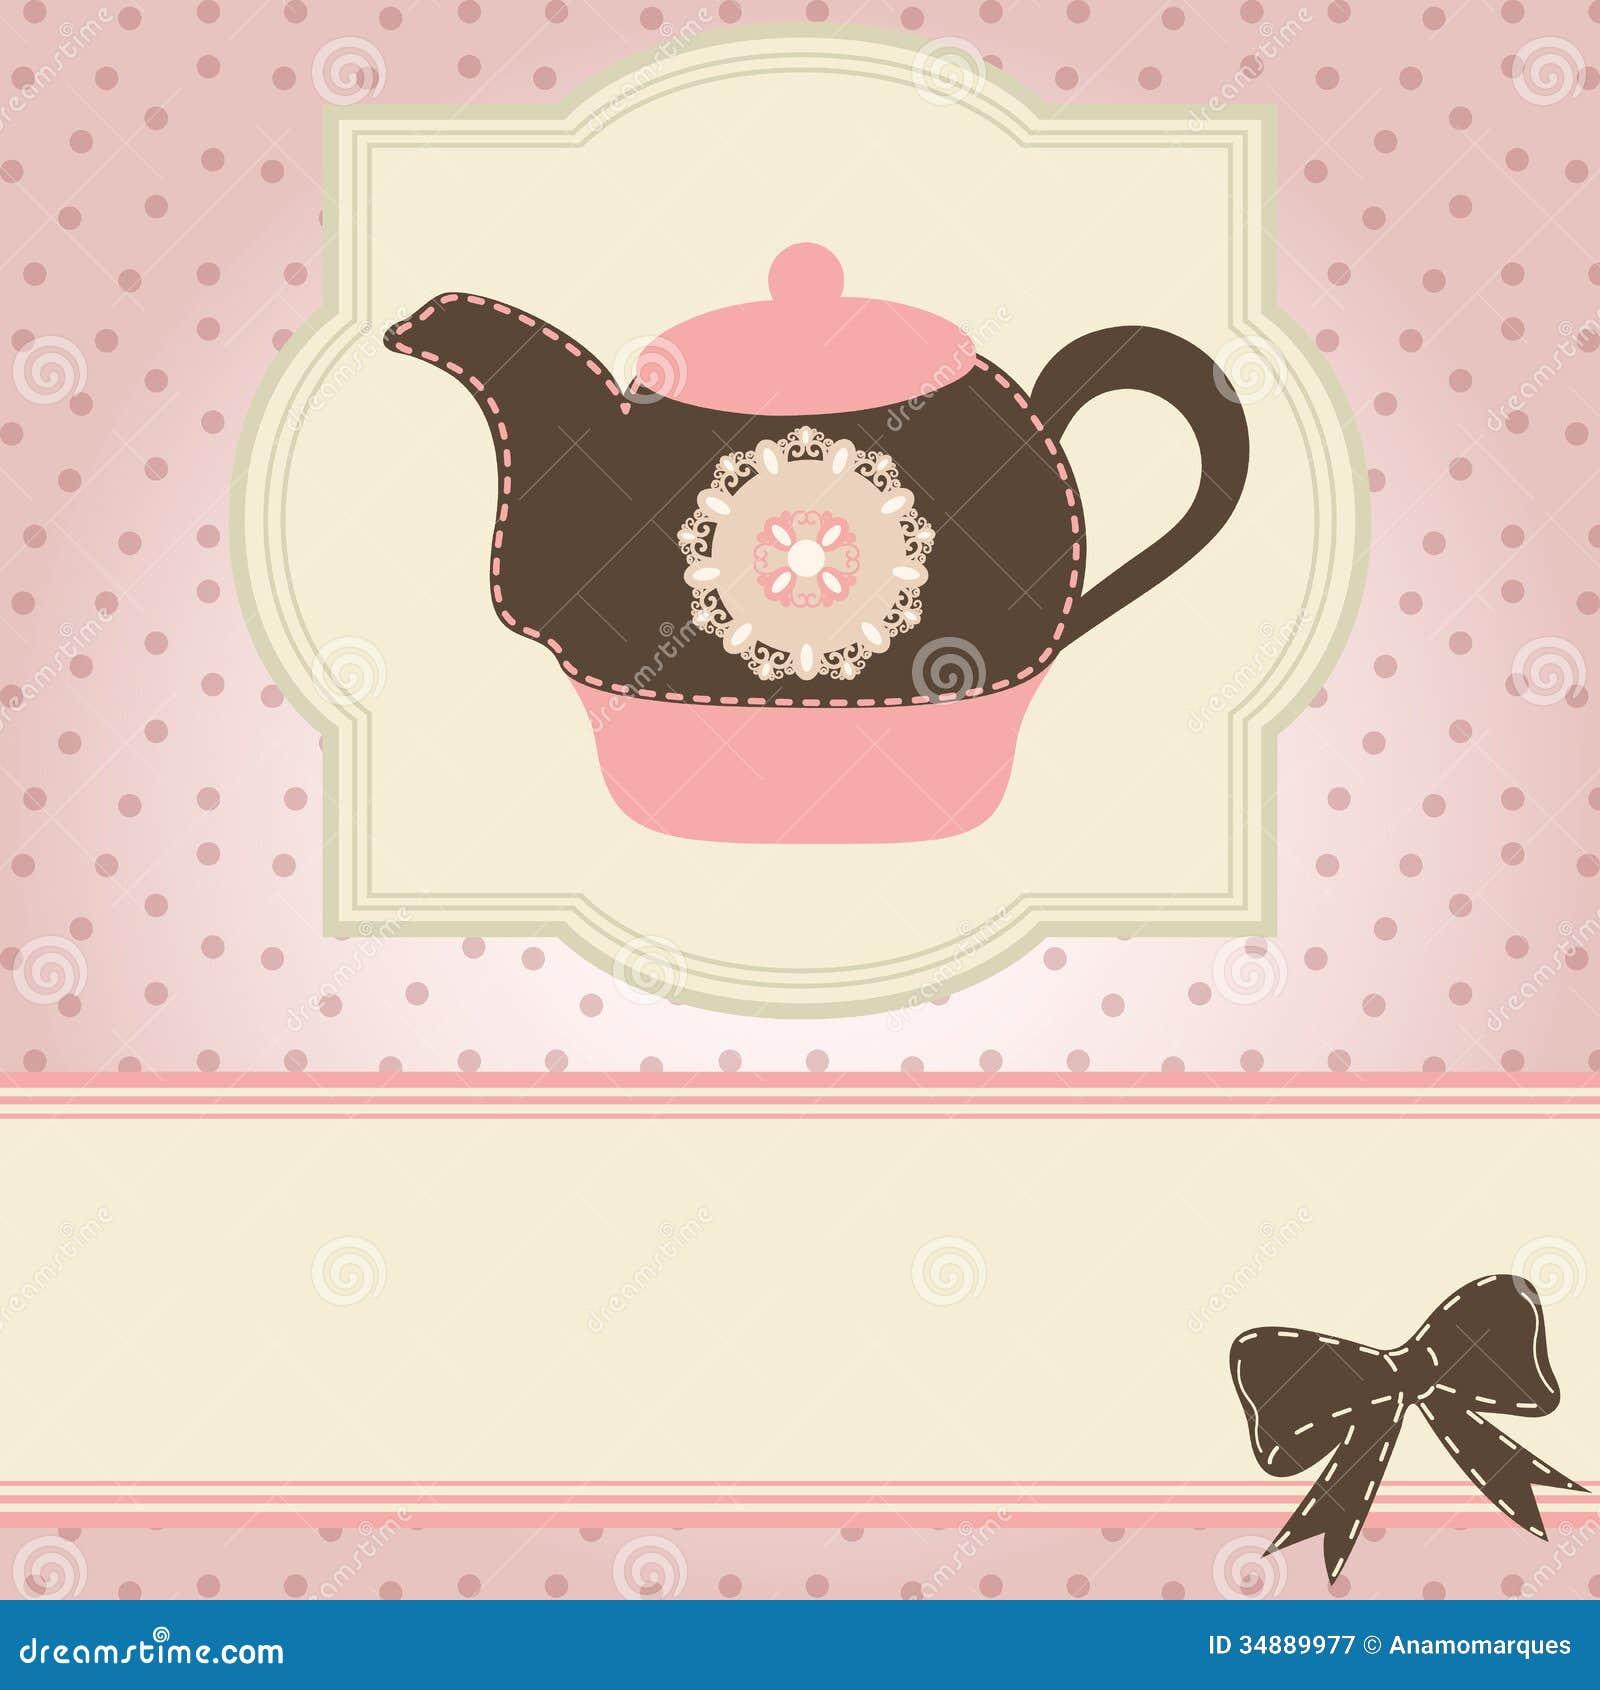 tea time stock vector illustration of coffee elegance 34889977. Black Bedroom Furniture Sets. Home Design Ideas